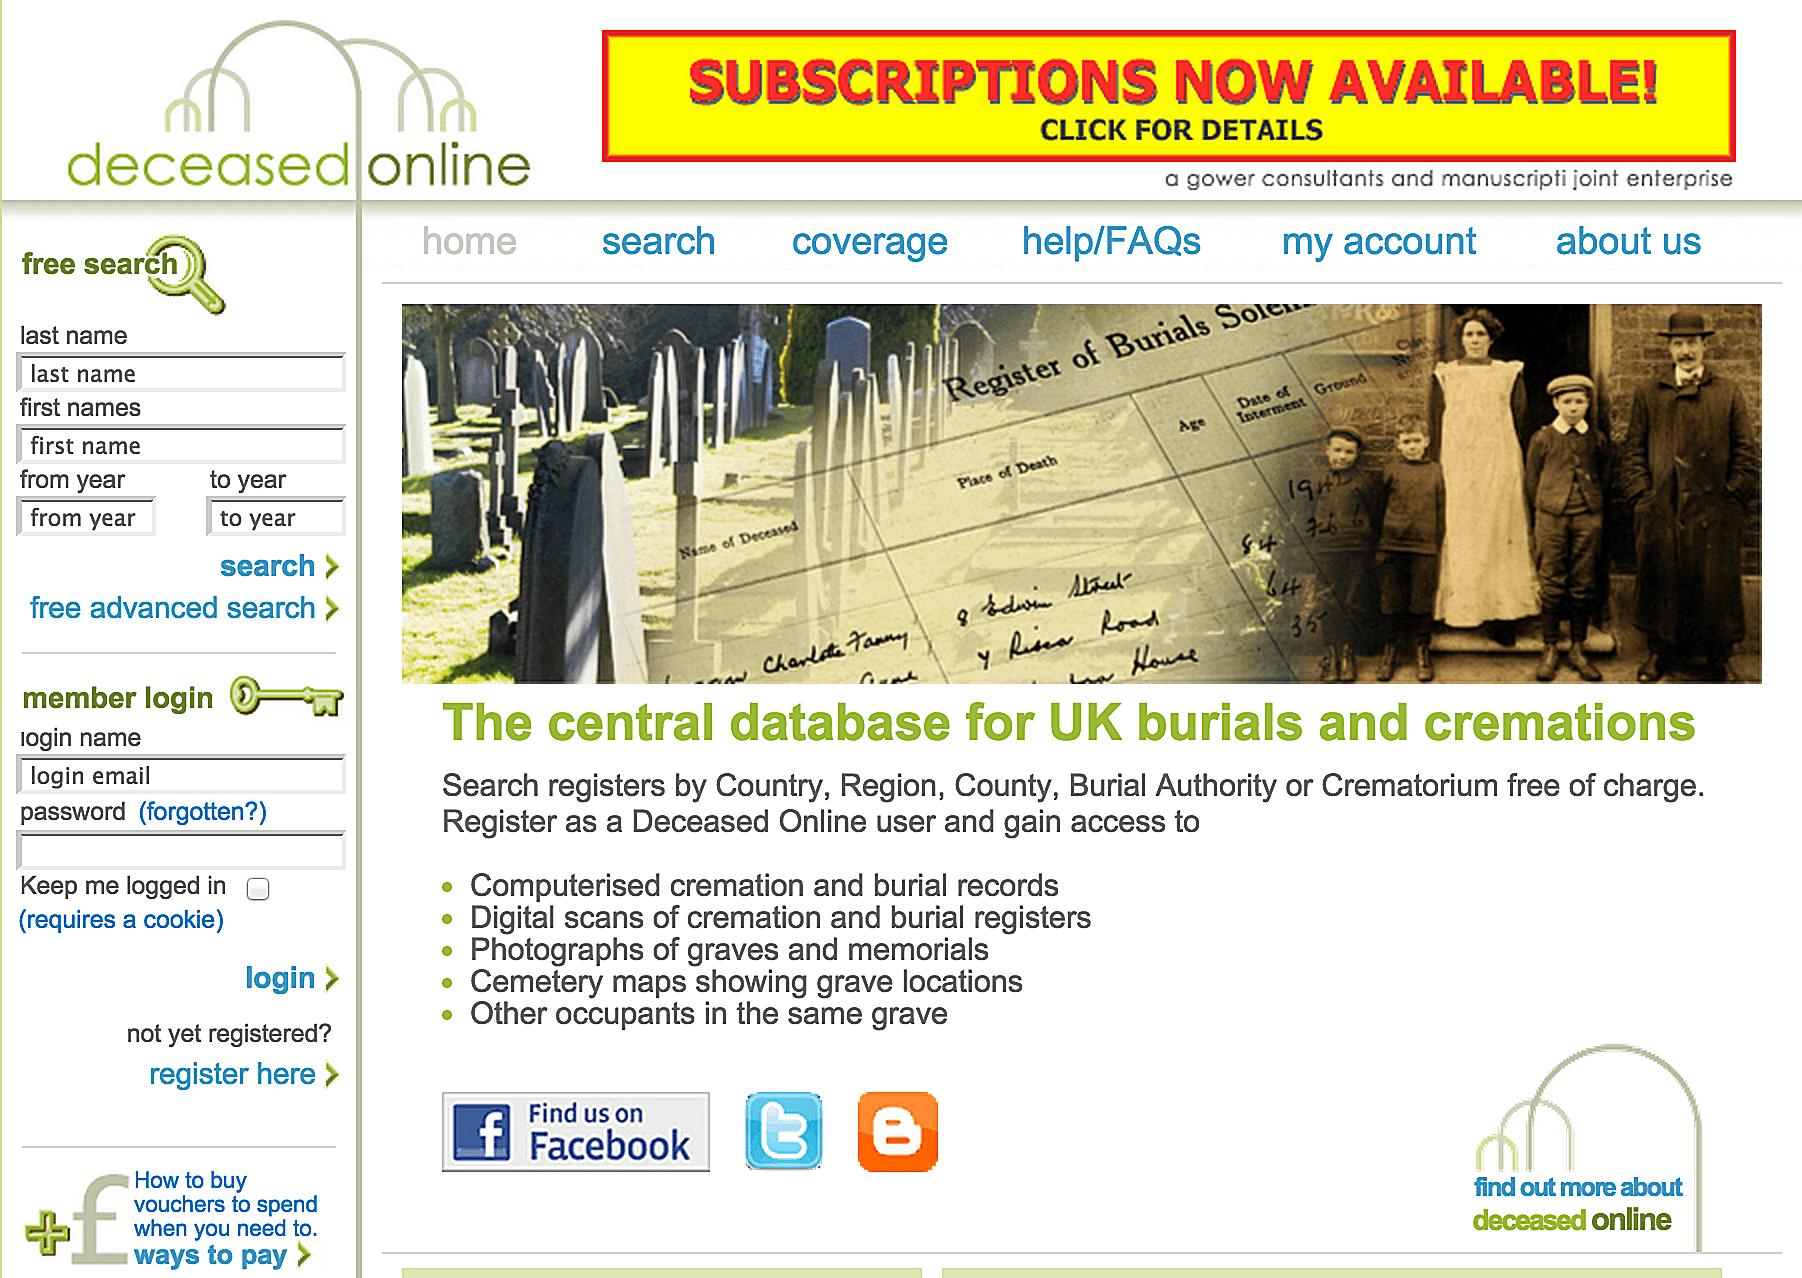 Deceased Online, μια κεντρική βάση δεδομένων για ταφές και νεκροτομίες στο Ηνωμένο Βασίλειο